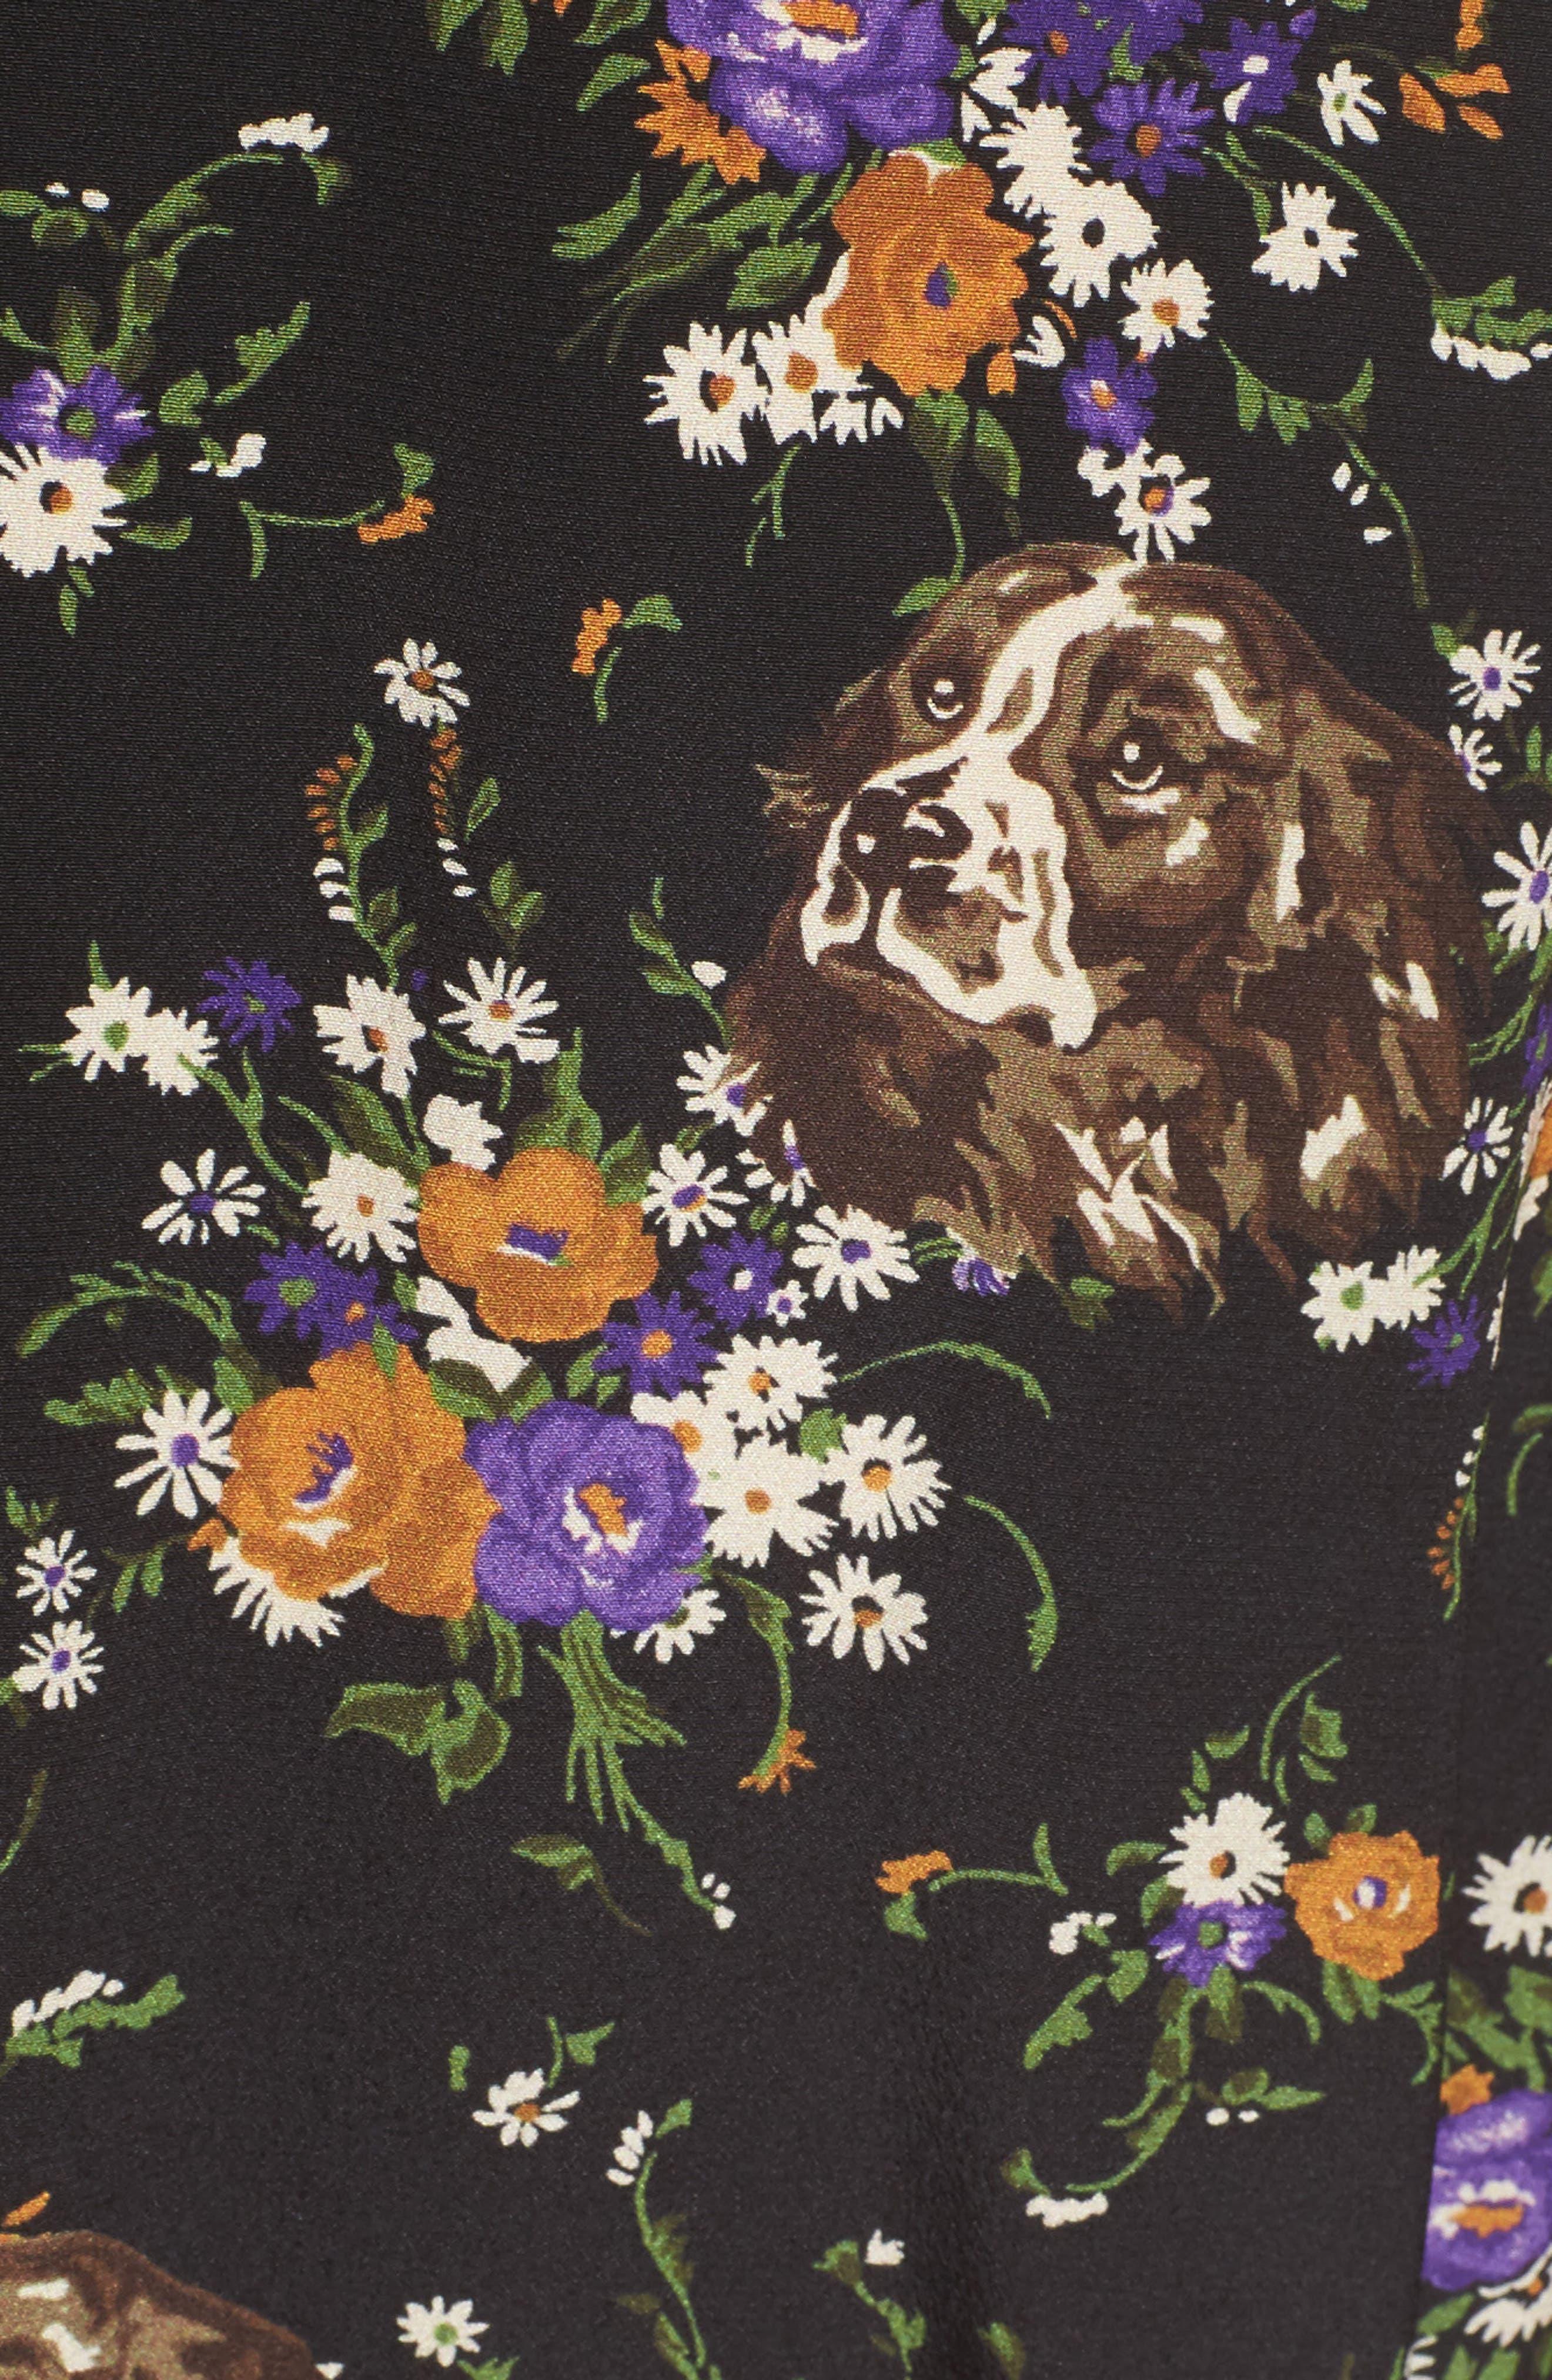 Western Lace & Silk Shirtdress,                             Alternate thumbnail 5, color,                             013